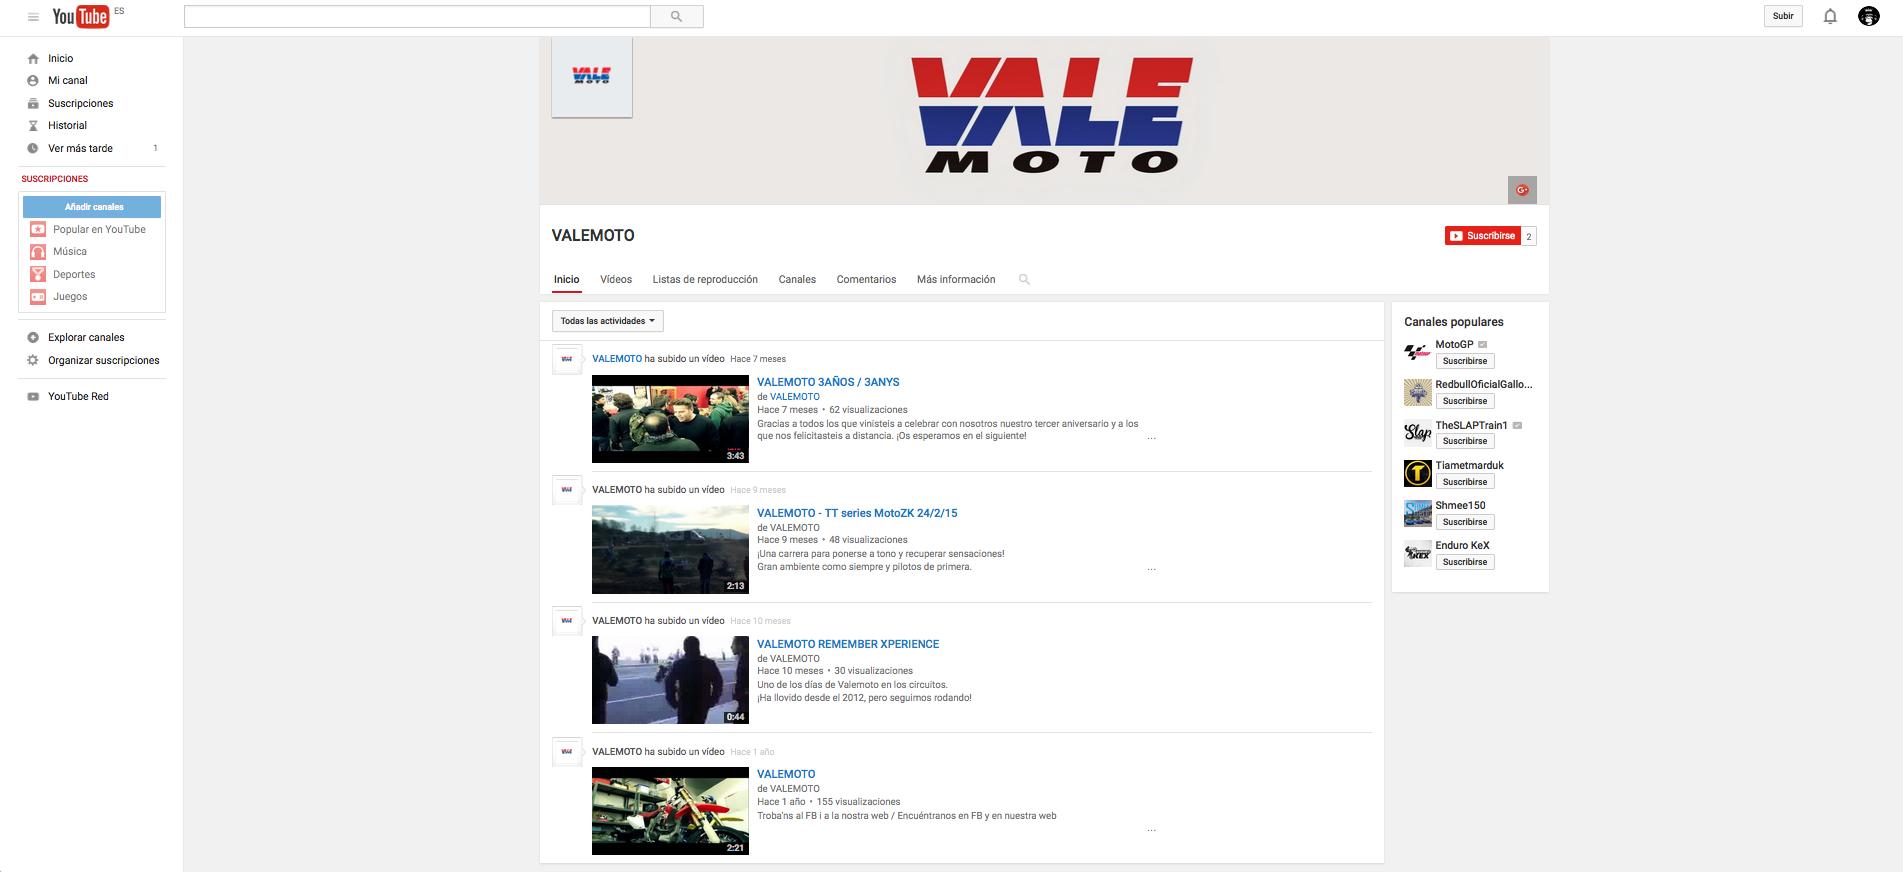 VALEMOTO - canal de youtube